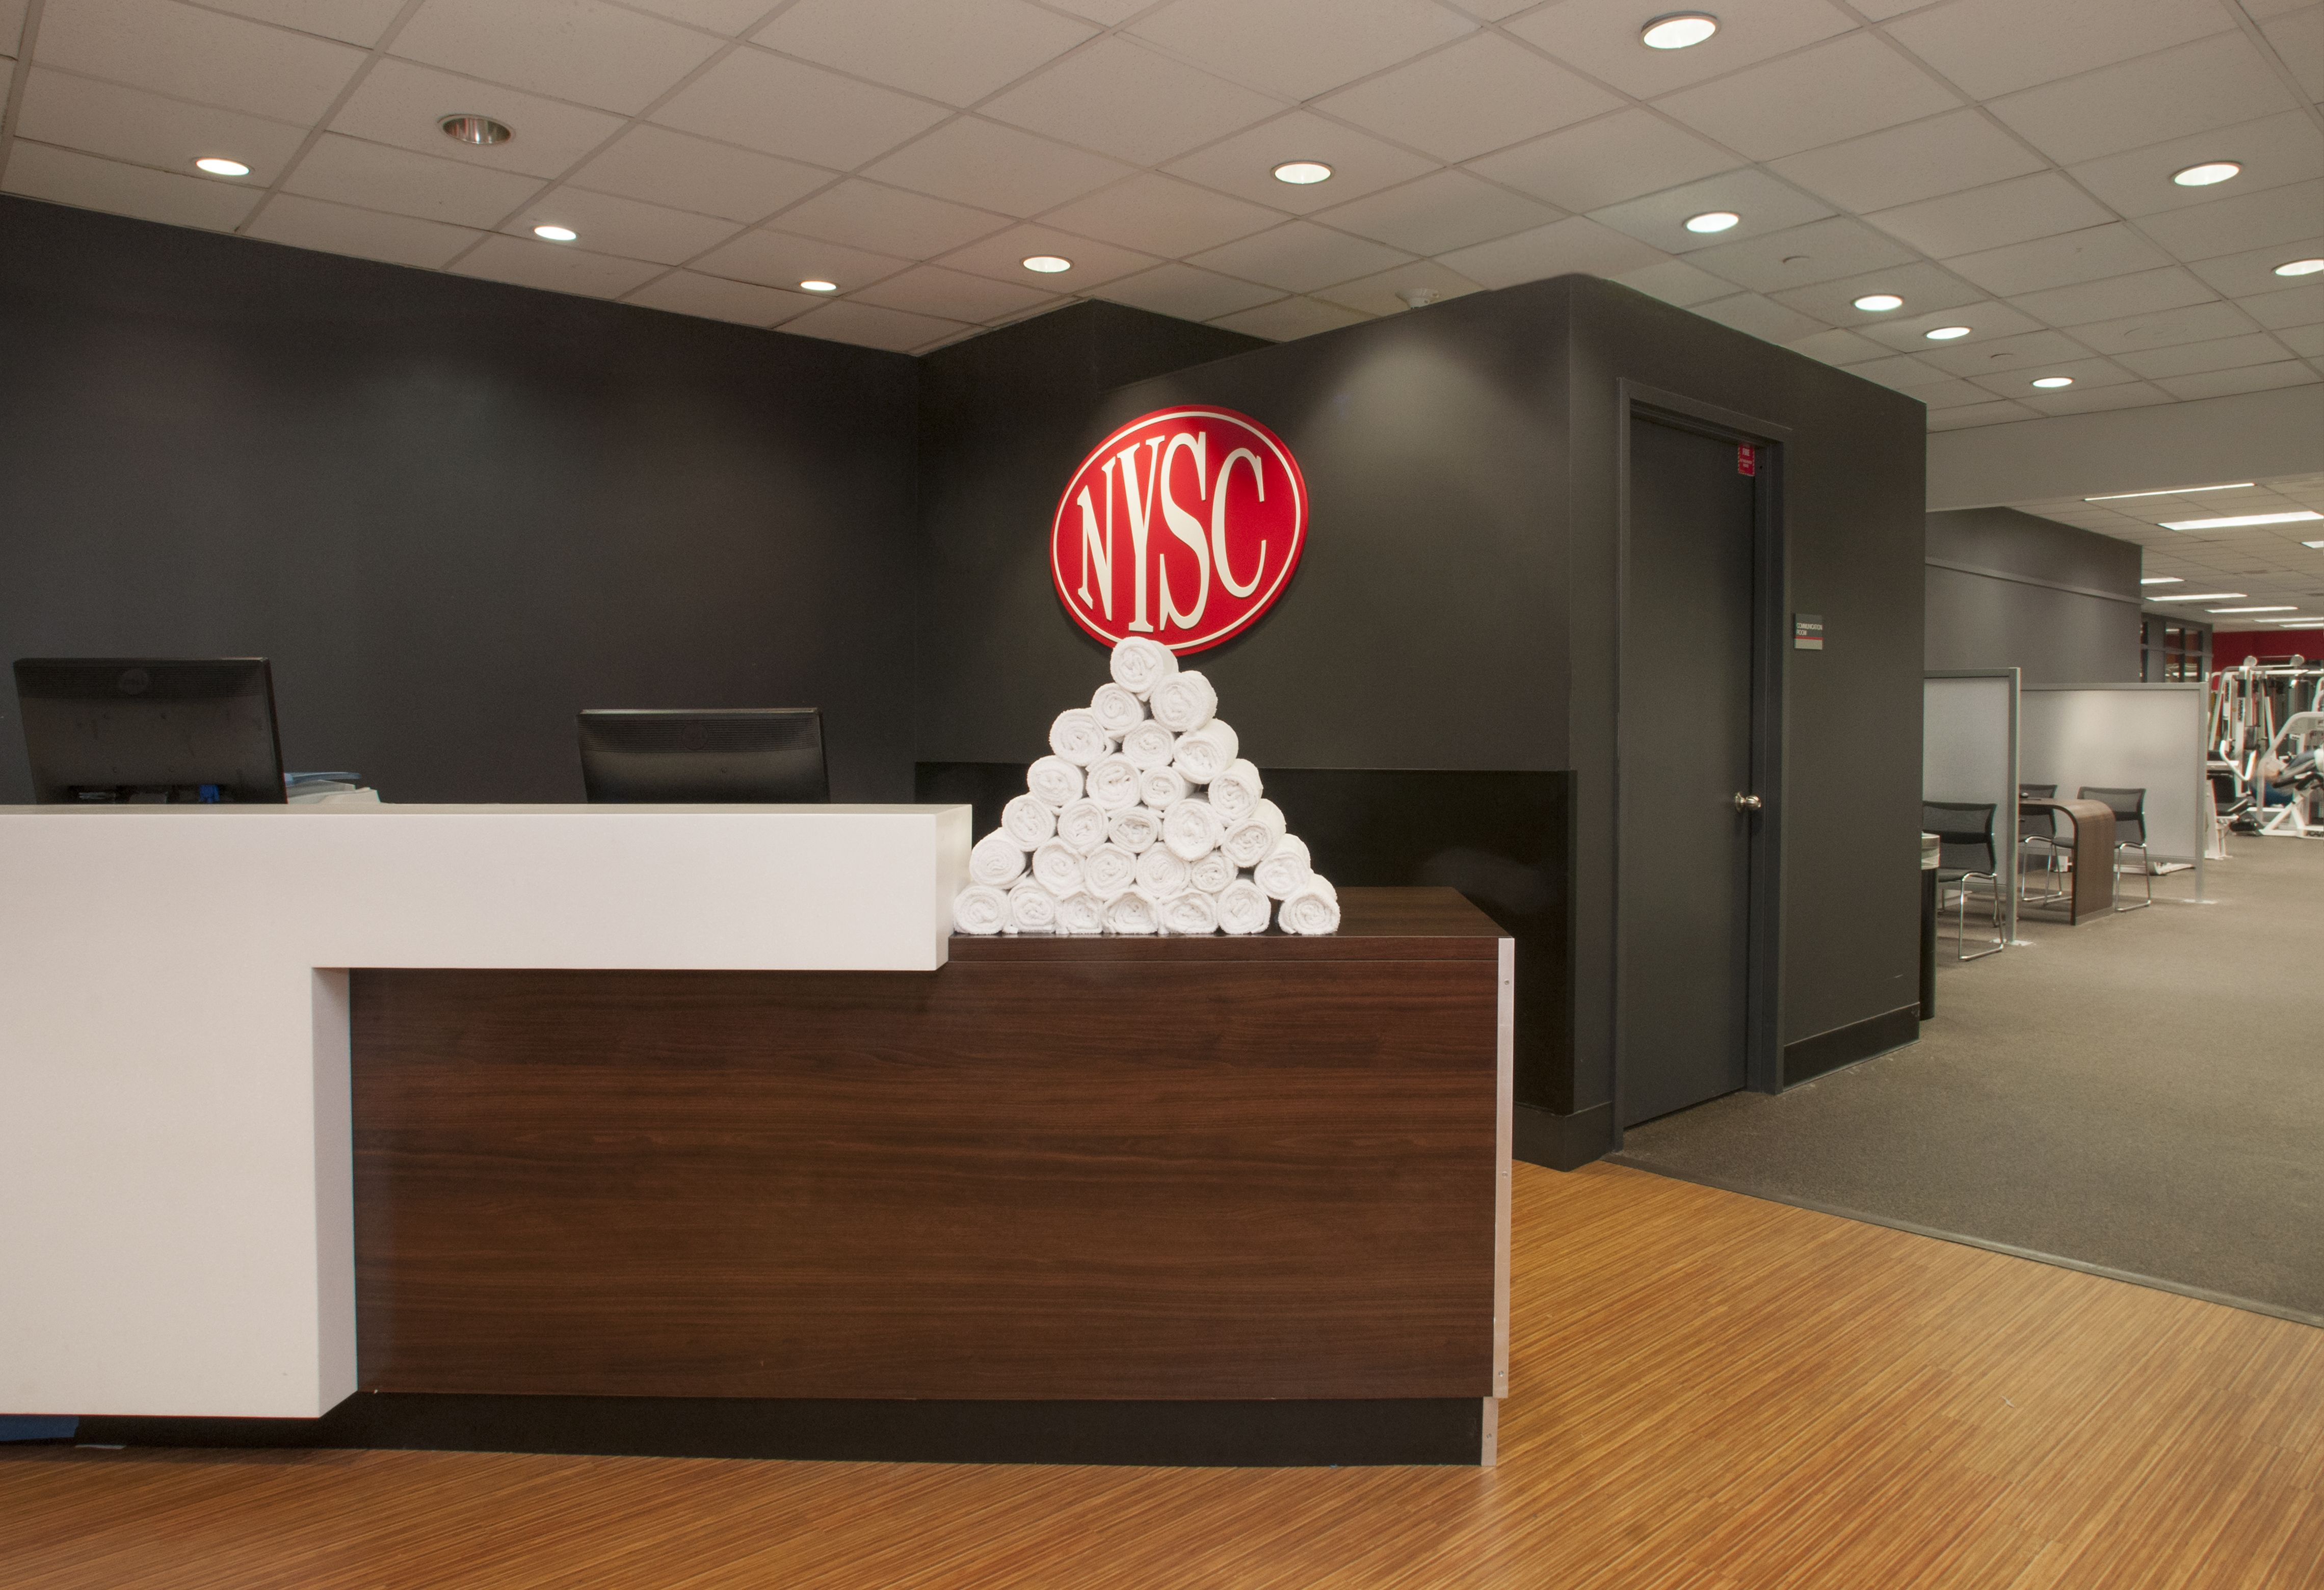 West End Towers New York Sports Club Locker Room -